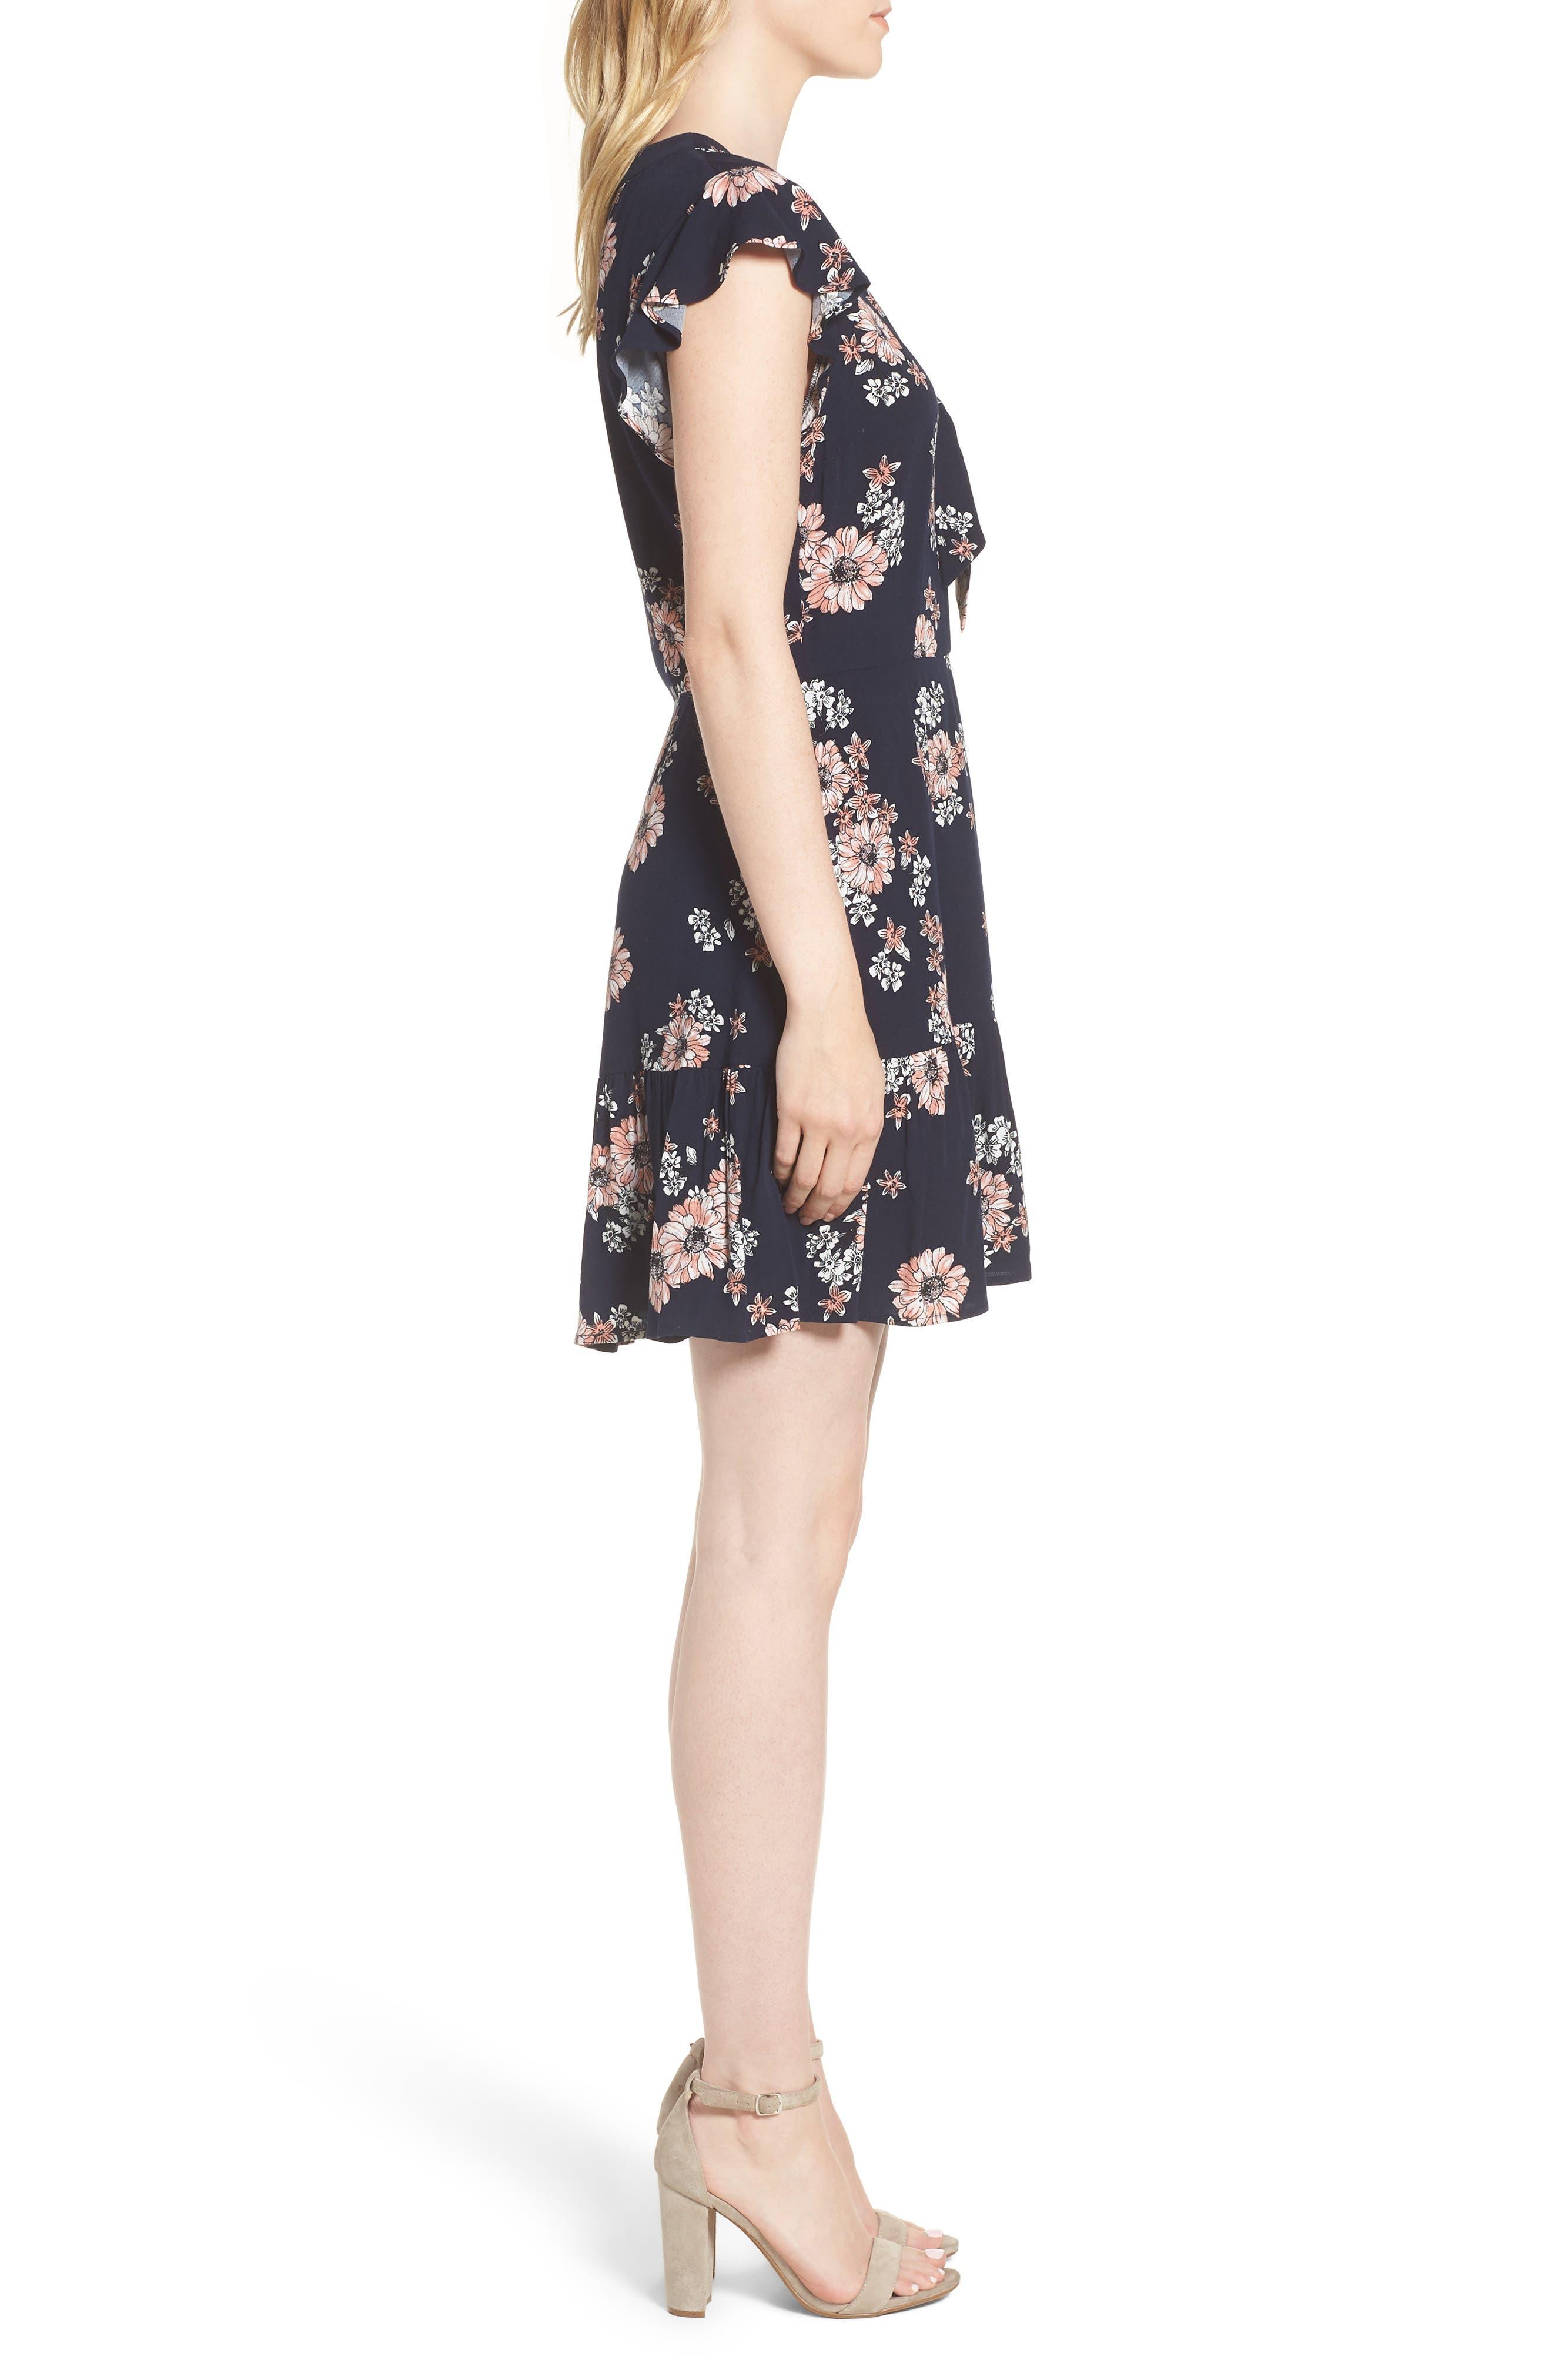 Dalma Floral Print Dress,                             Alternate thumbnail 3, color,